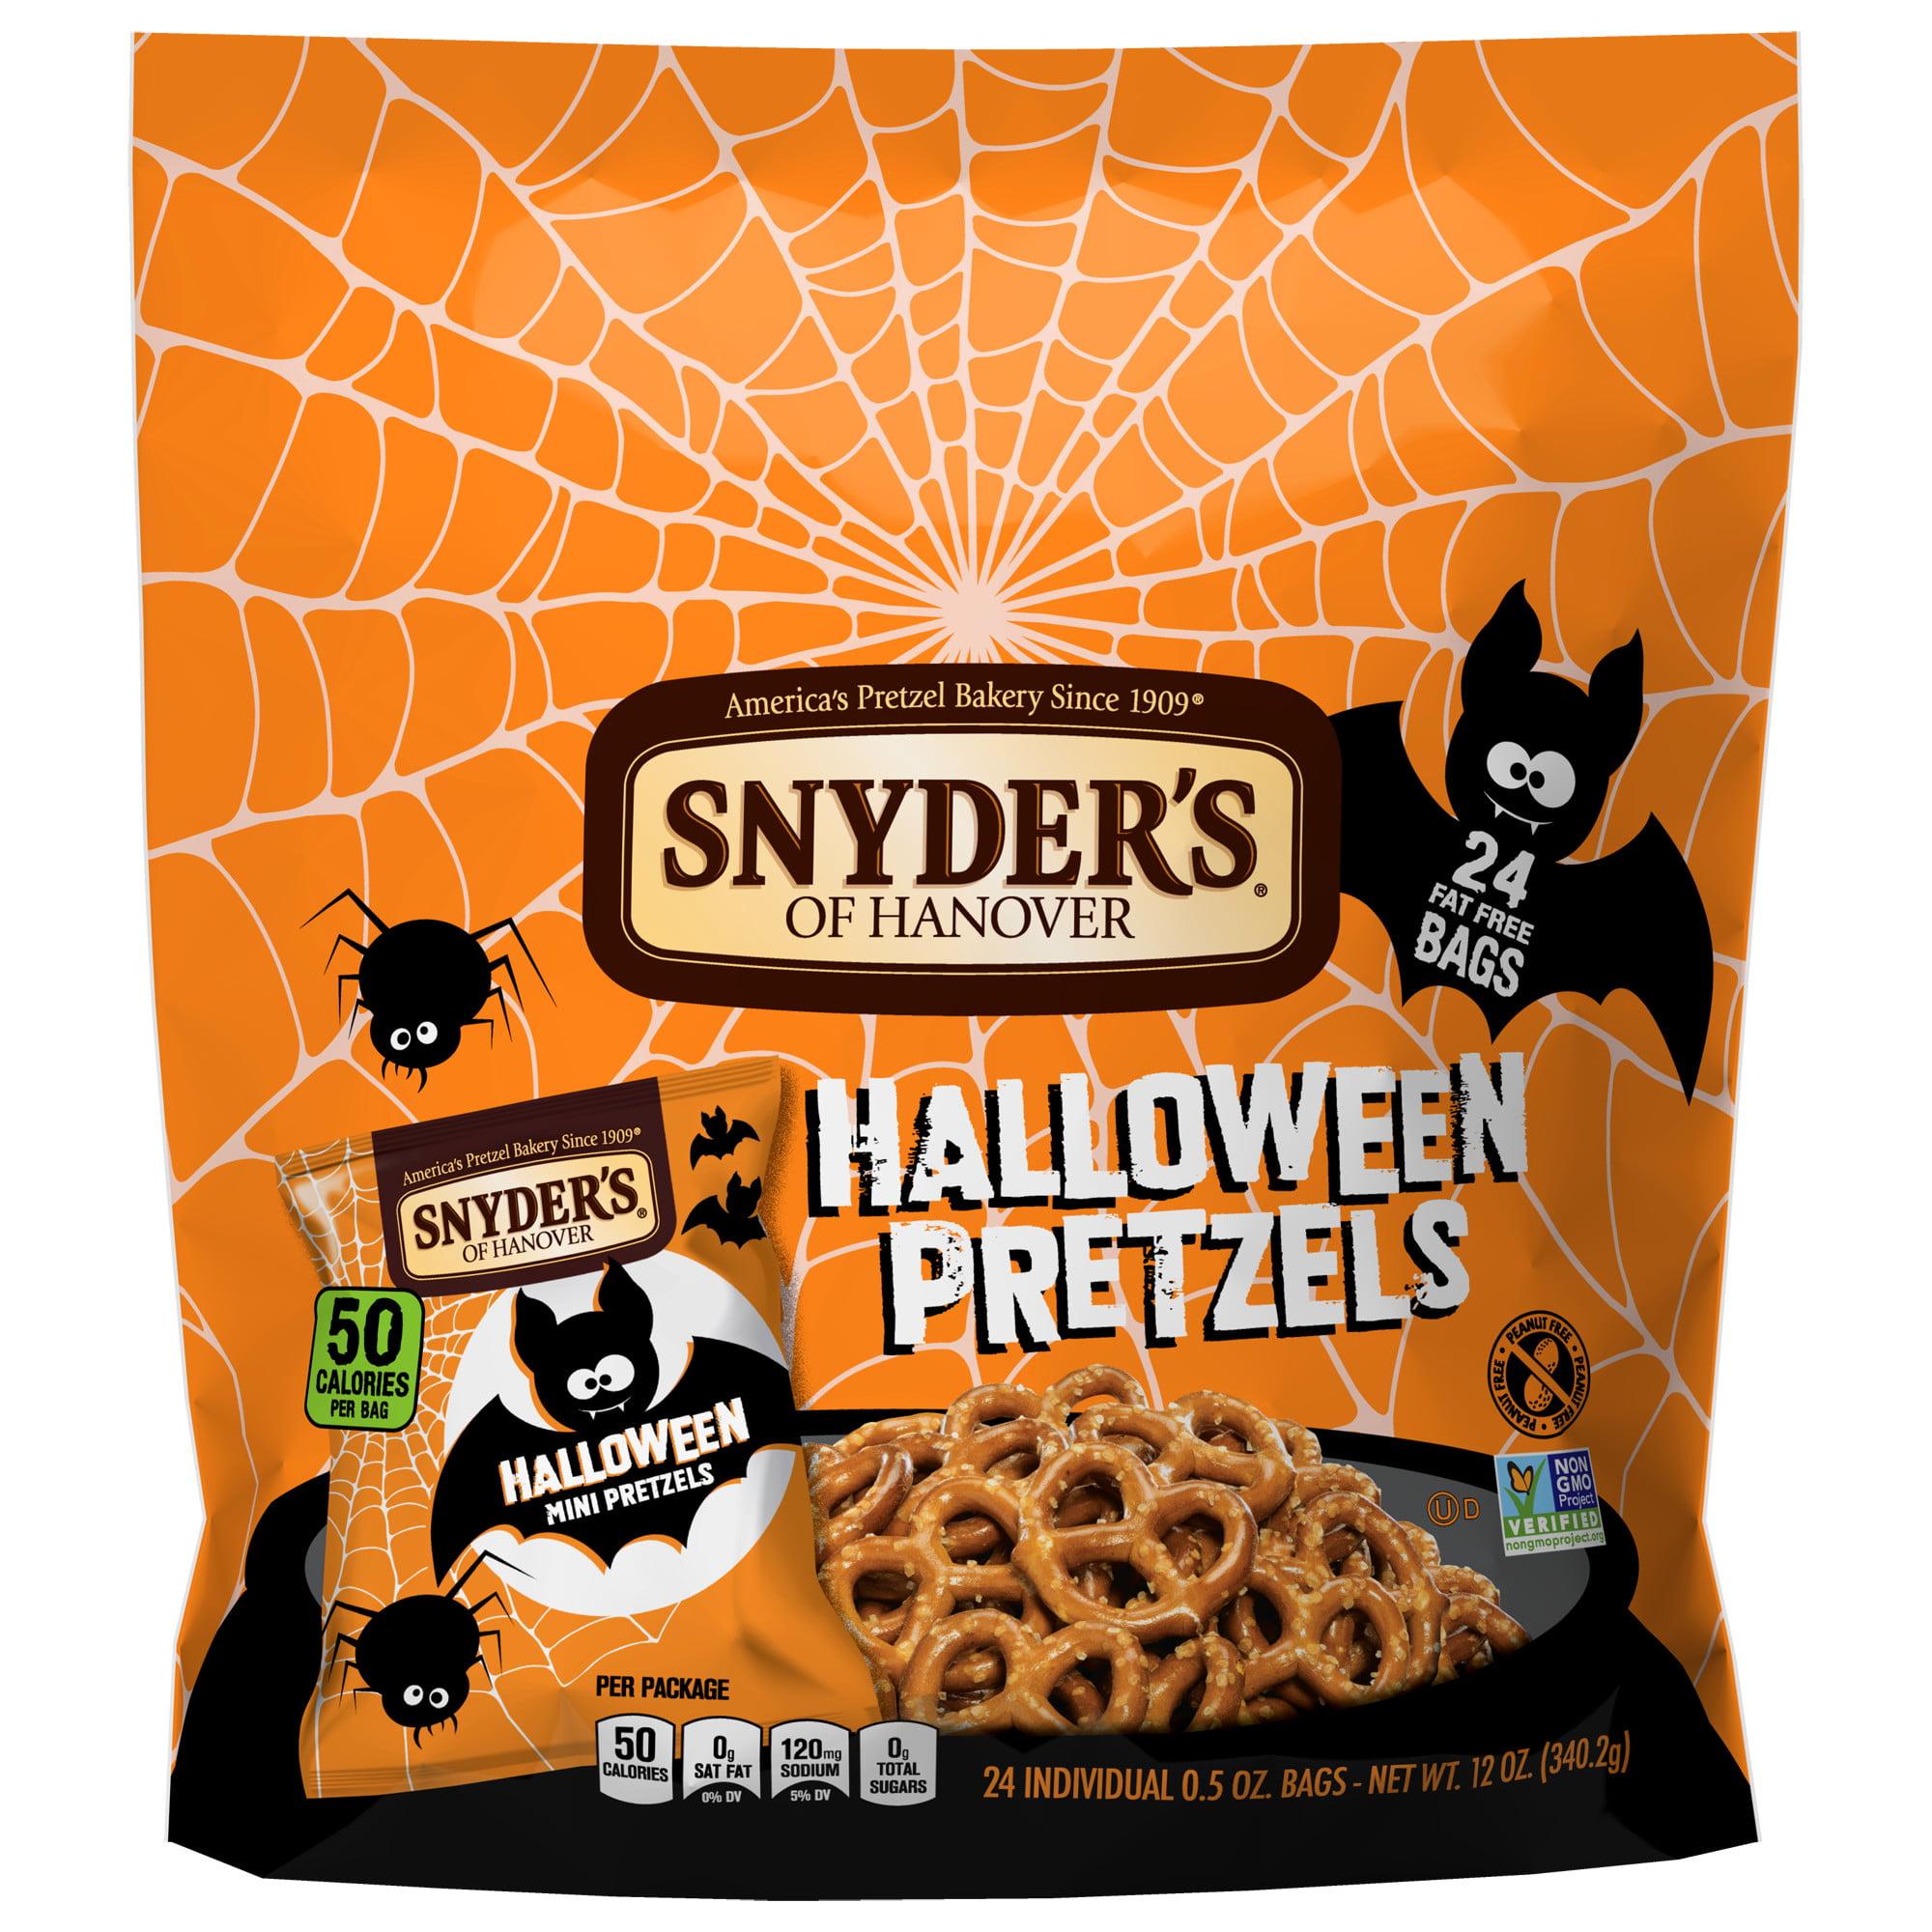 Snyder's of Hanover Mini Pretzels, Halloween Trick-or-Treat Snack Sack, 0.5 Oz, 24 Ct